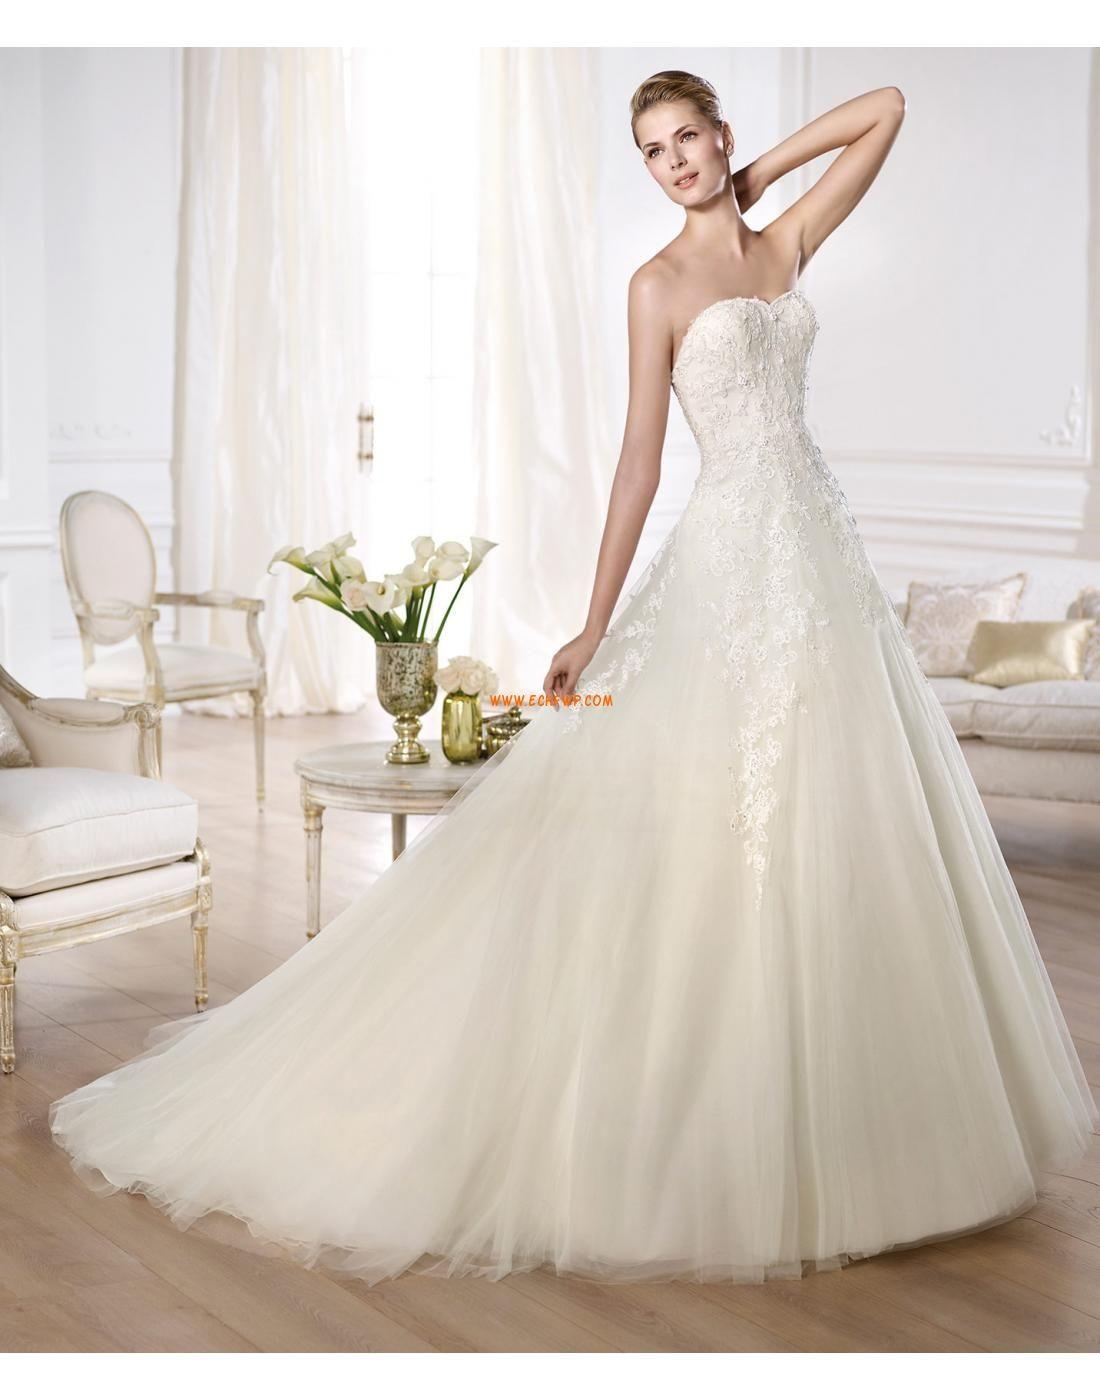 Vestidos de novia baratos slp